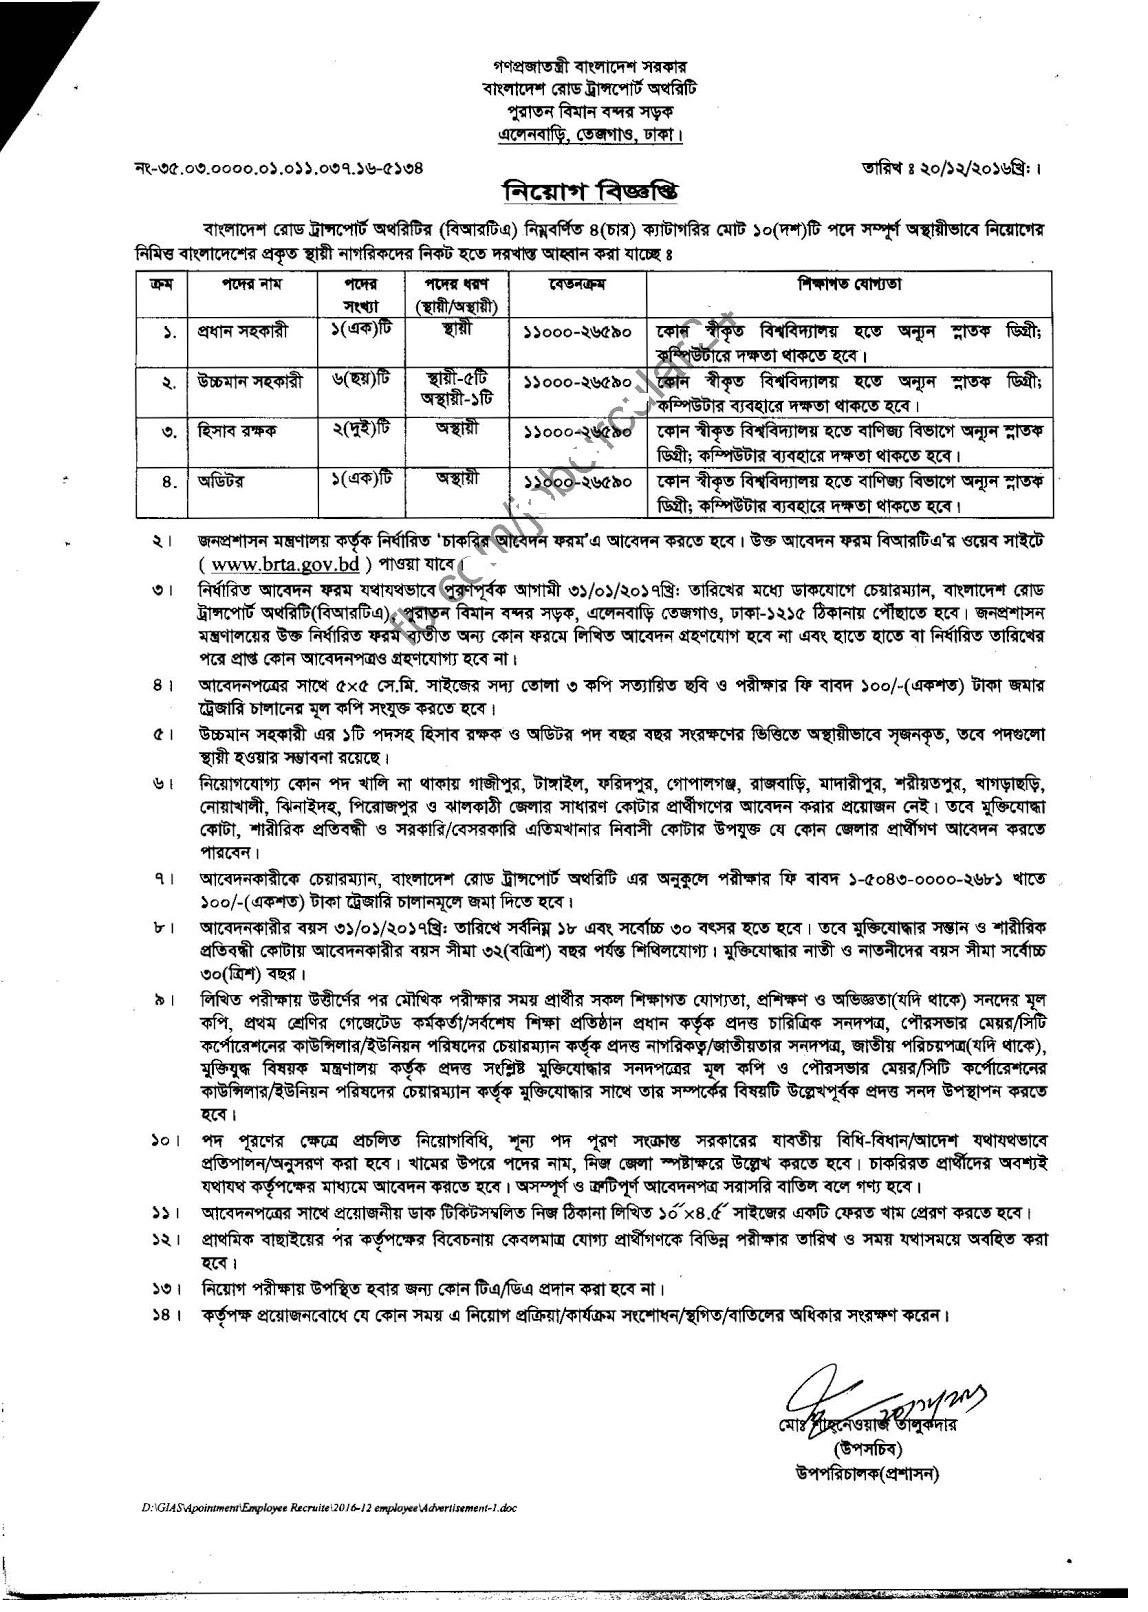 Bangladesh Road Transport Authority (BRTA) Jobs Circular 2017